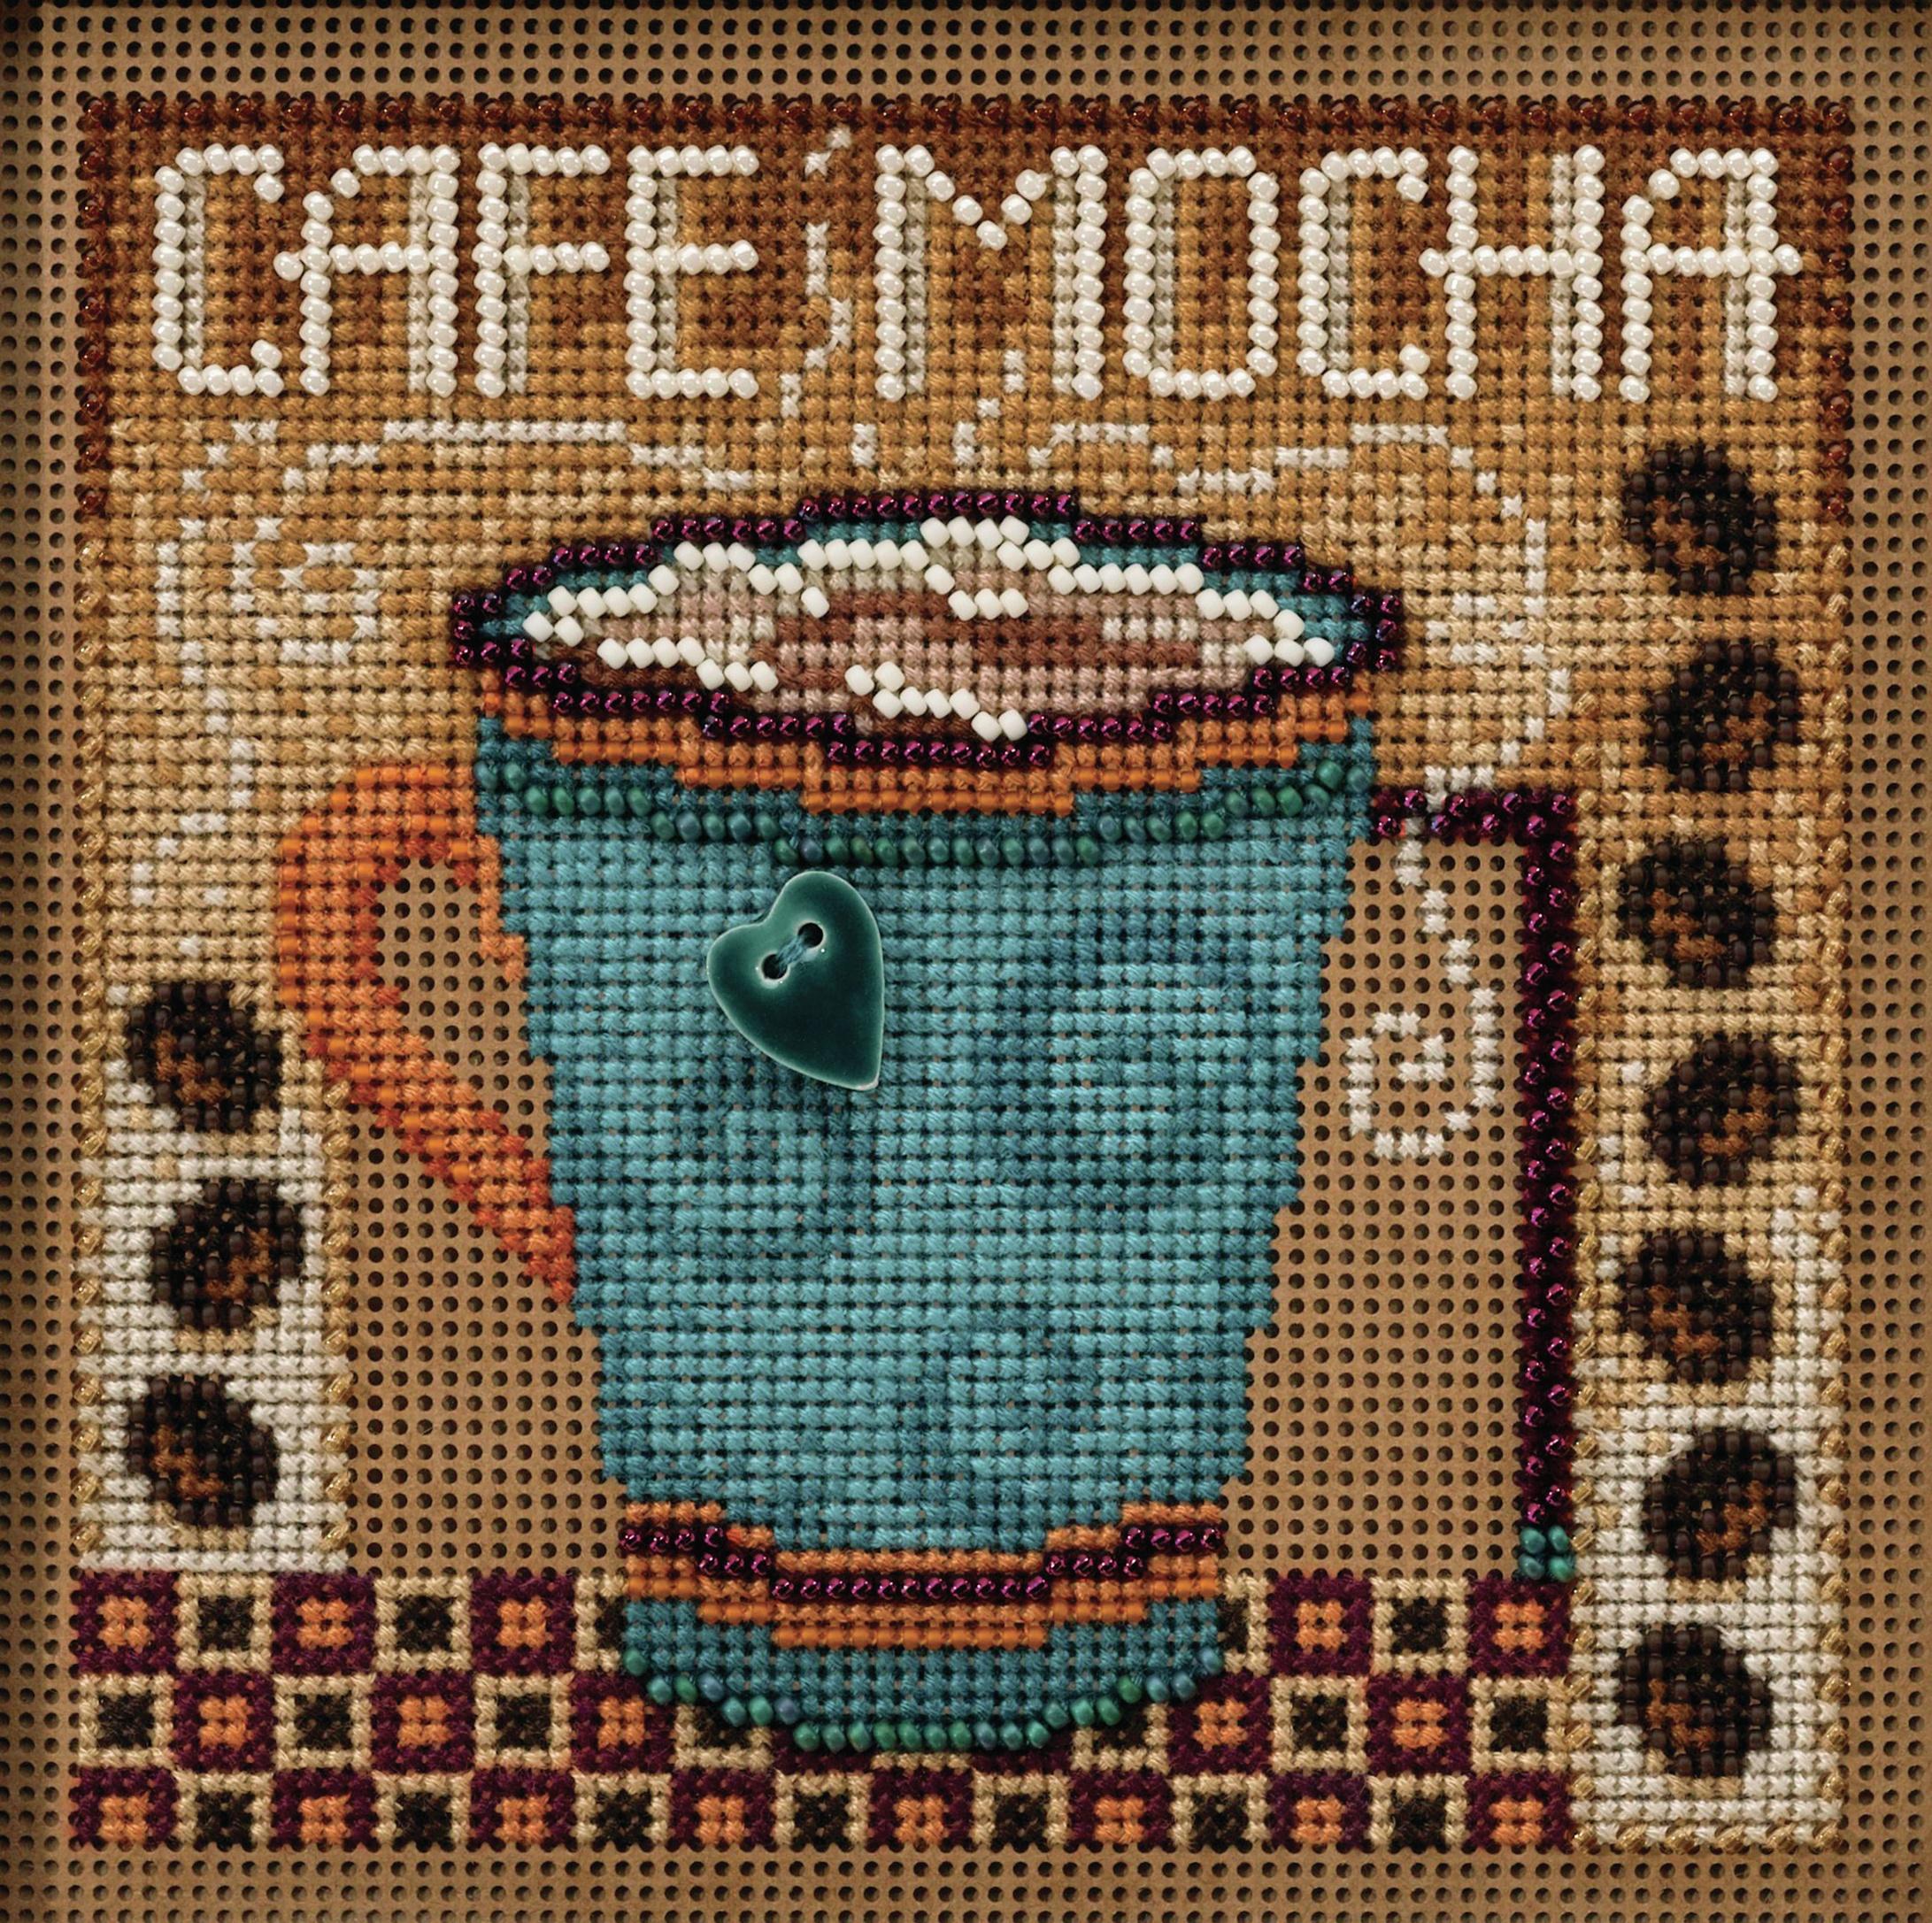 Cafe Mocha counted cross stitch kit